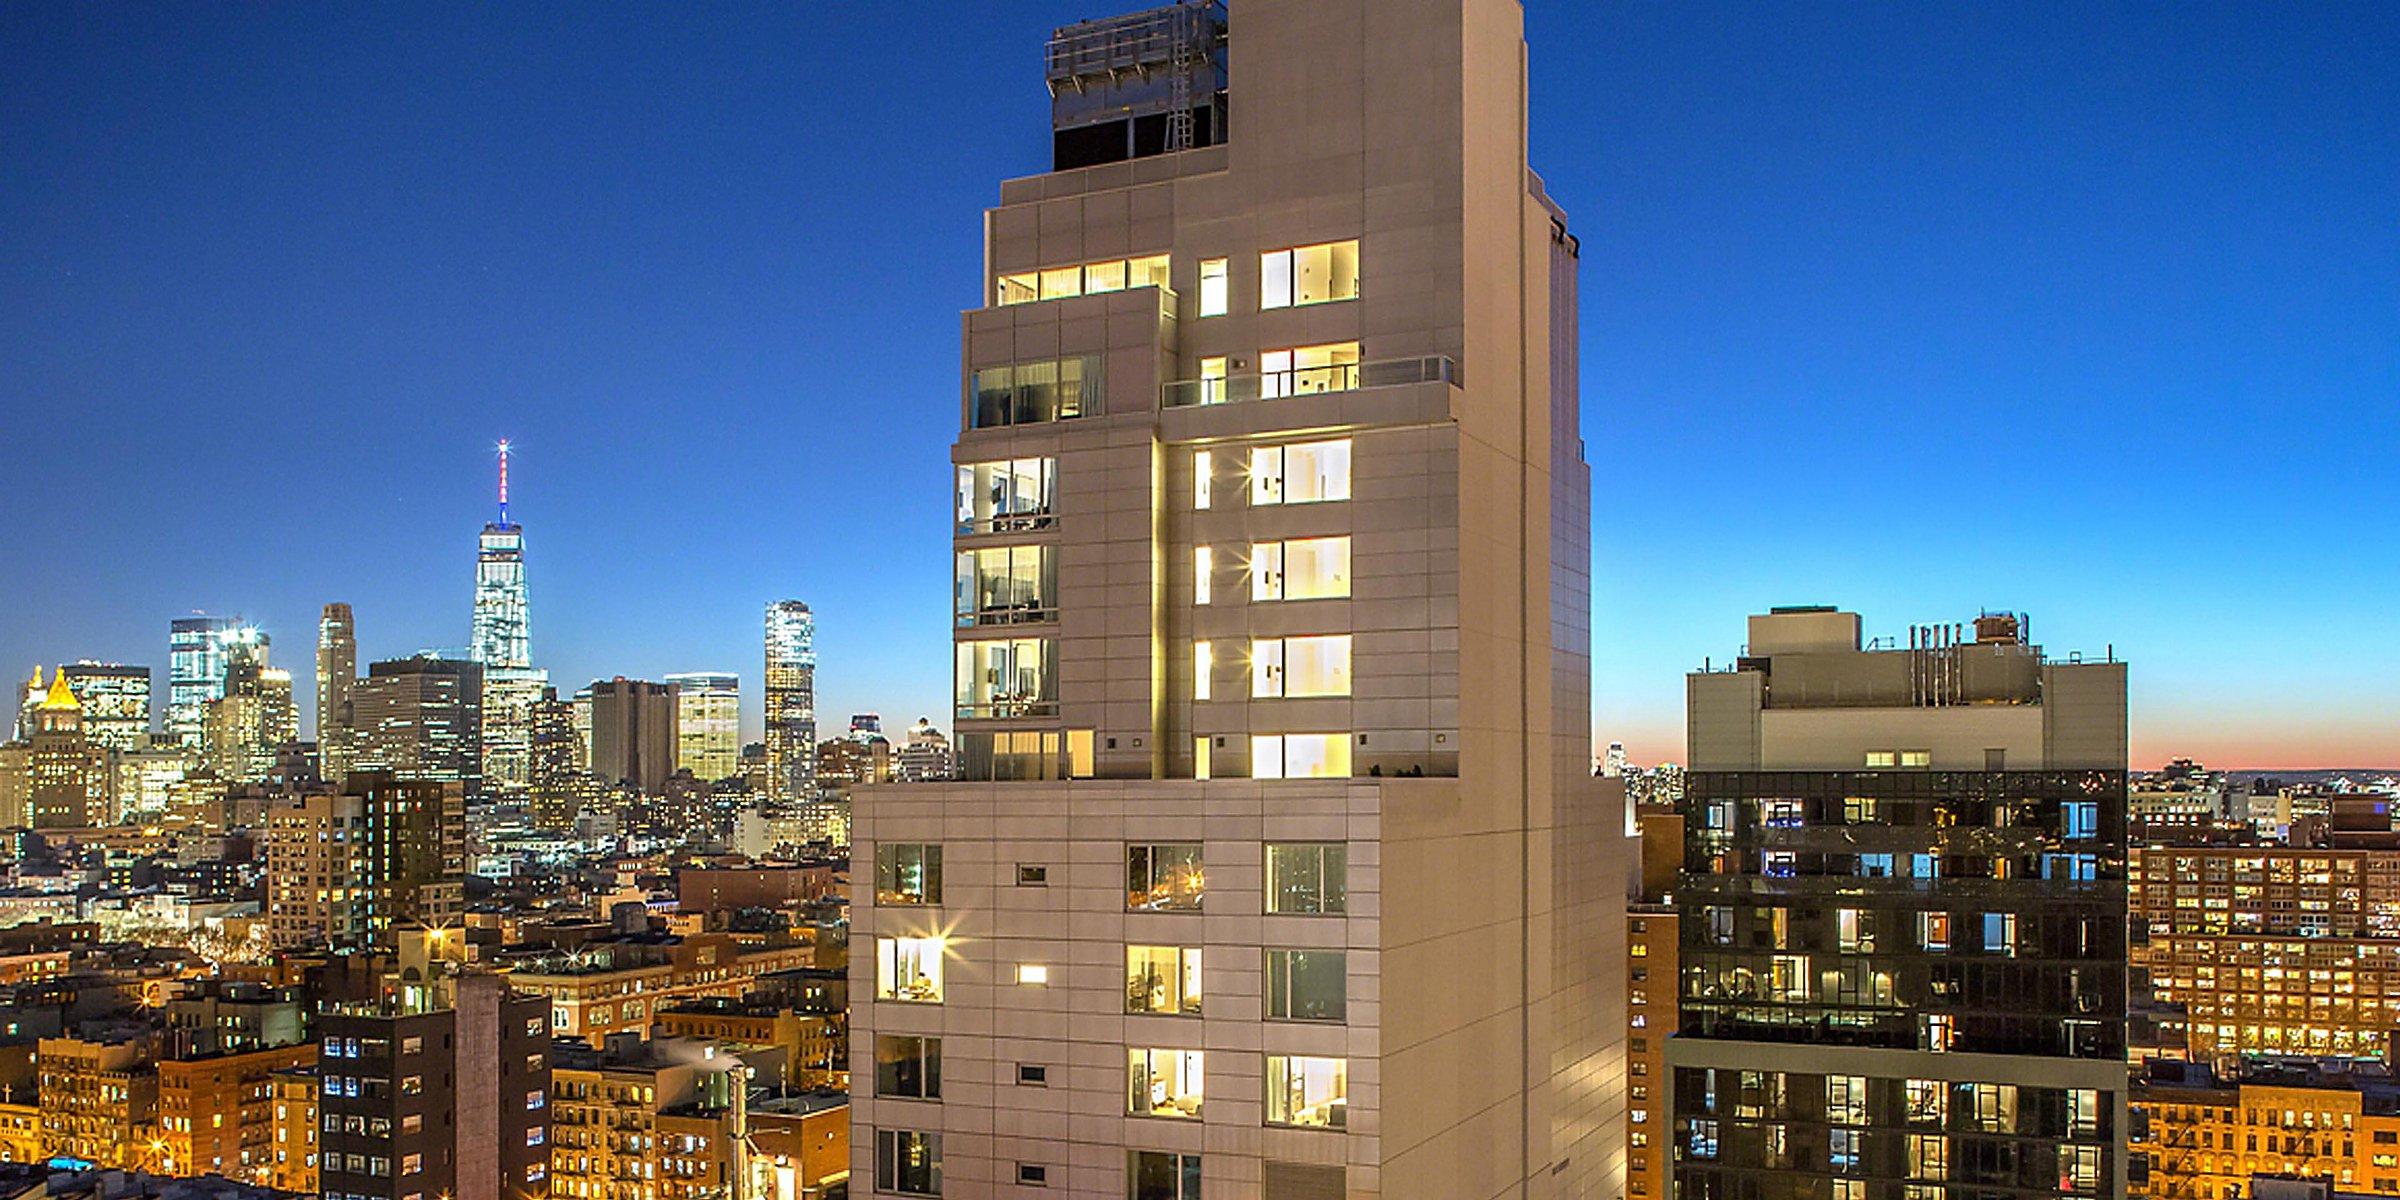 Boutique Hotels near East Village NYC | Hotel Indigo Lower East Side